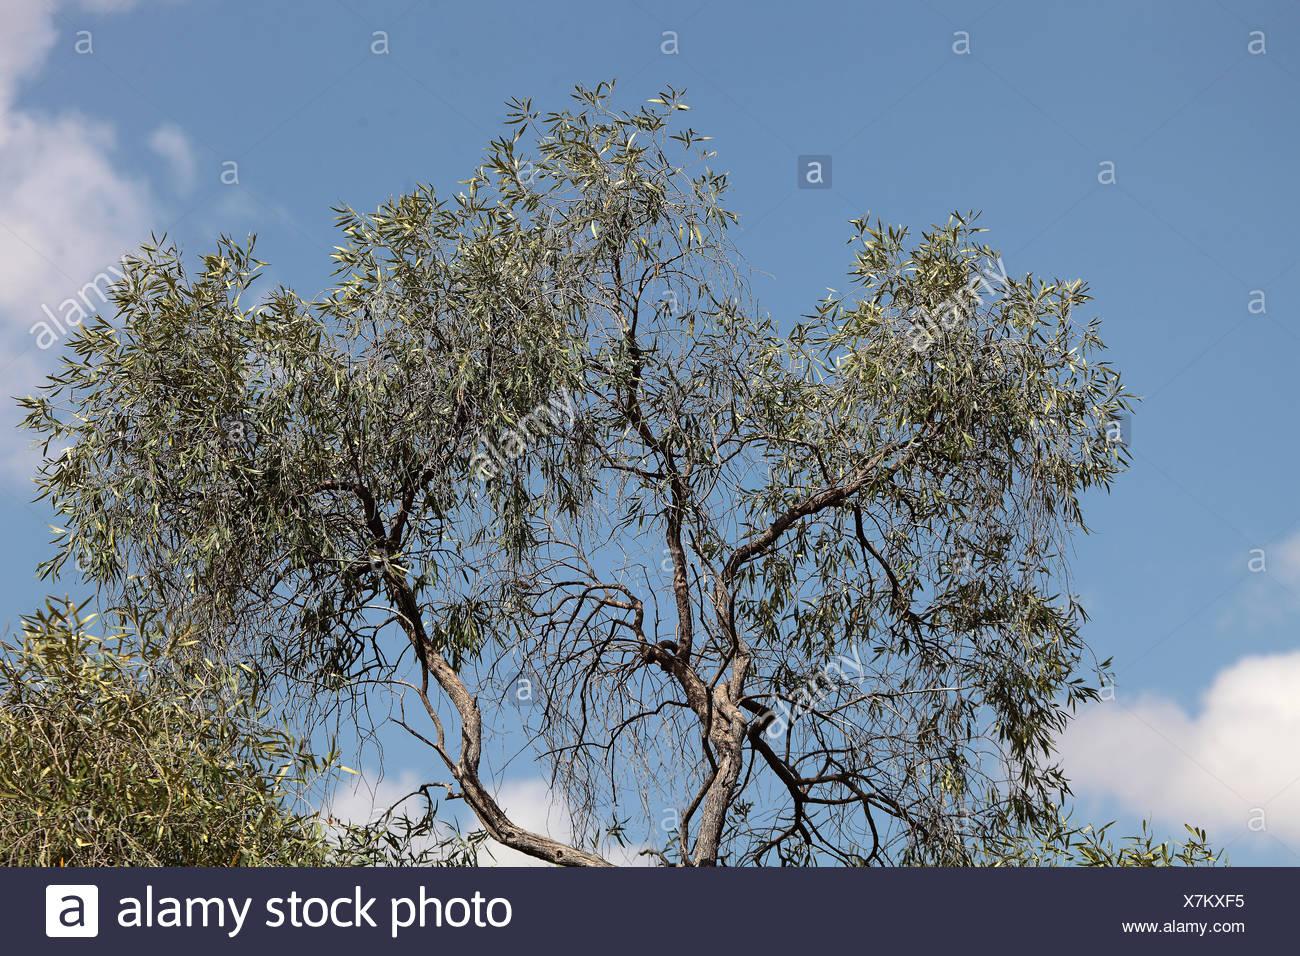 Afrikanischer Olivenbaum - Stock Image